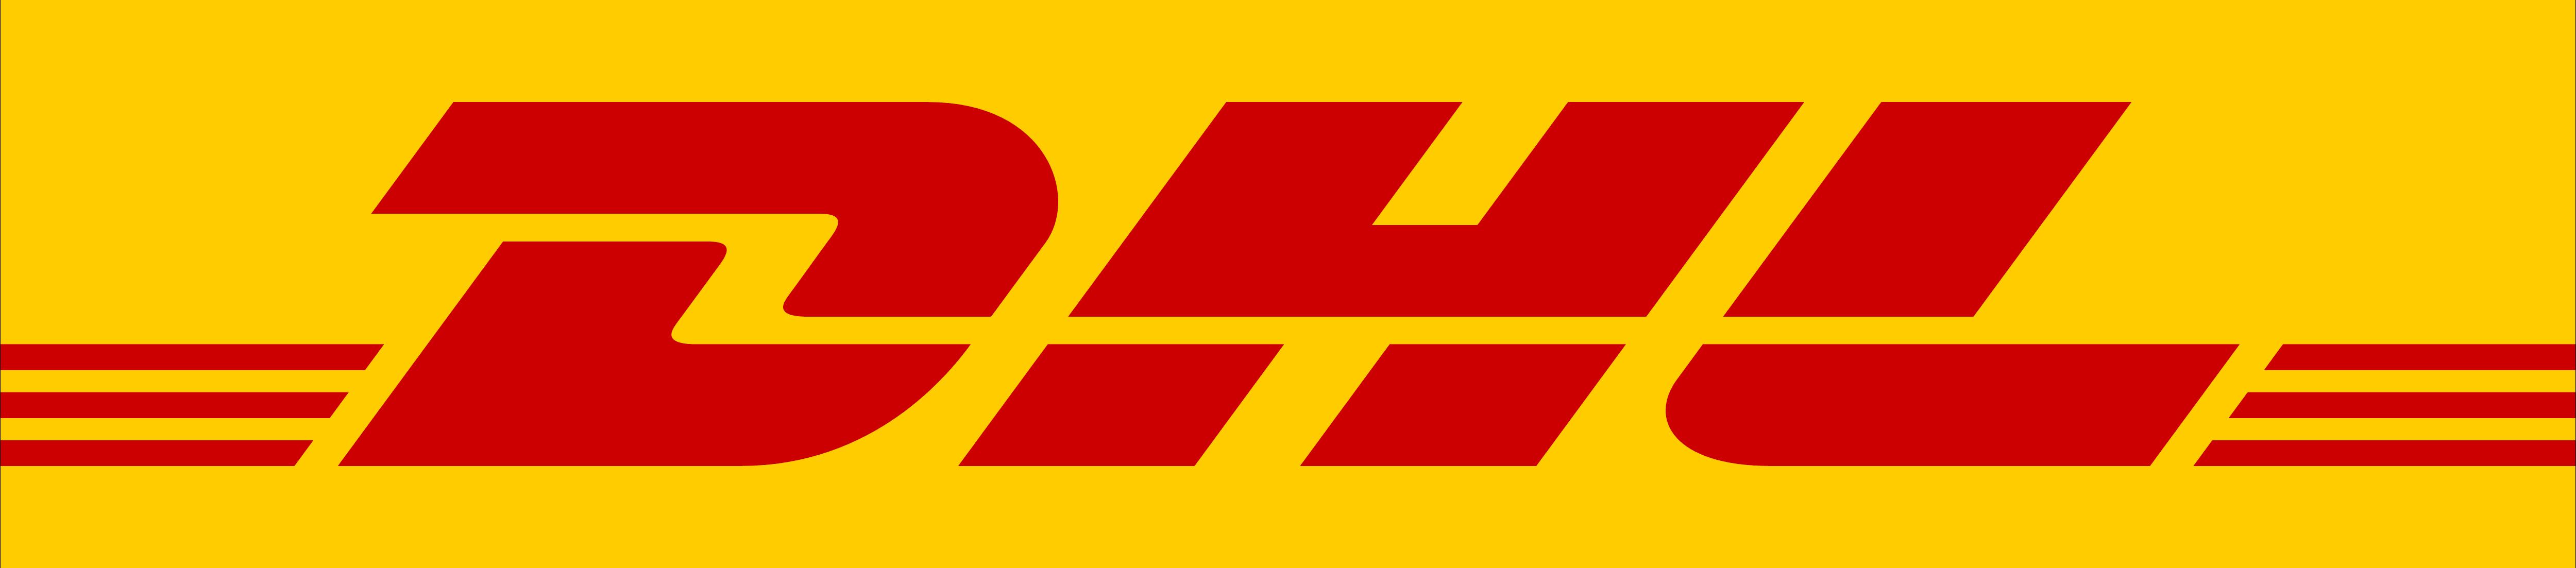 image DHL